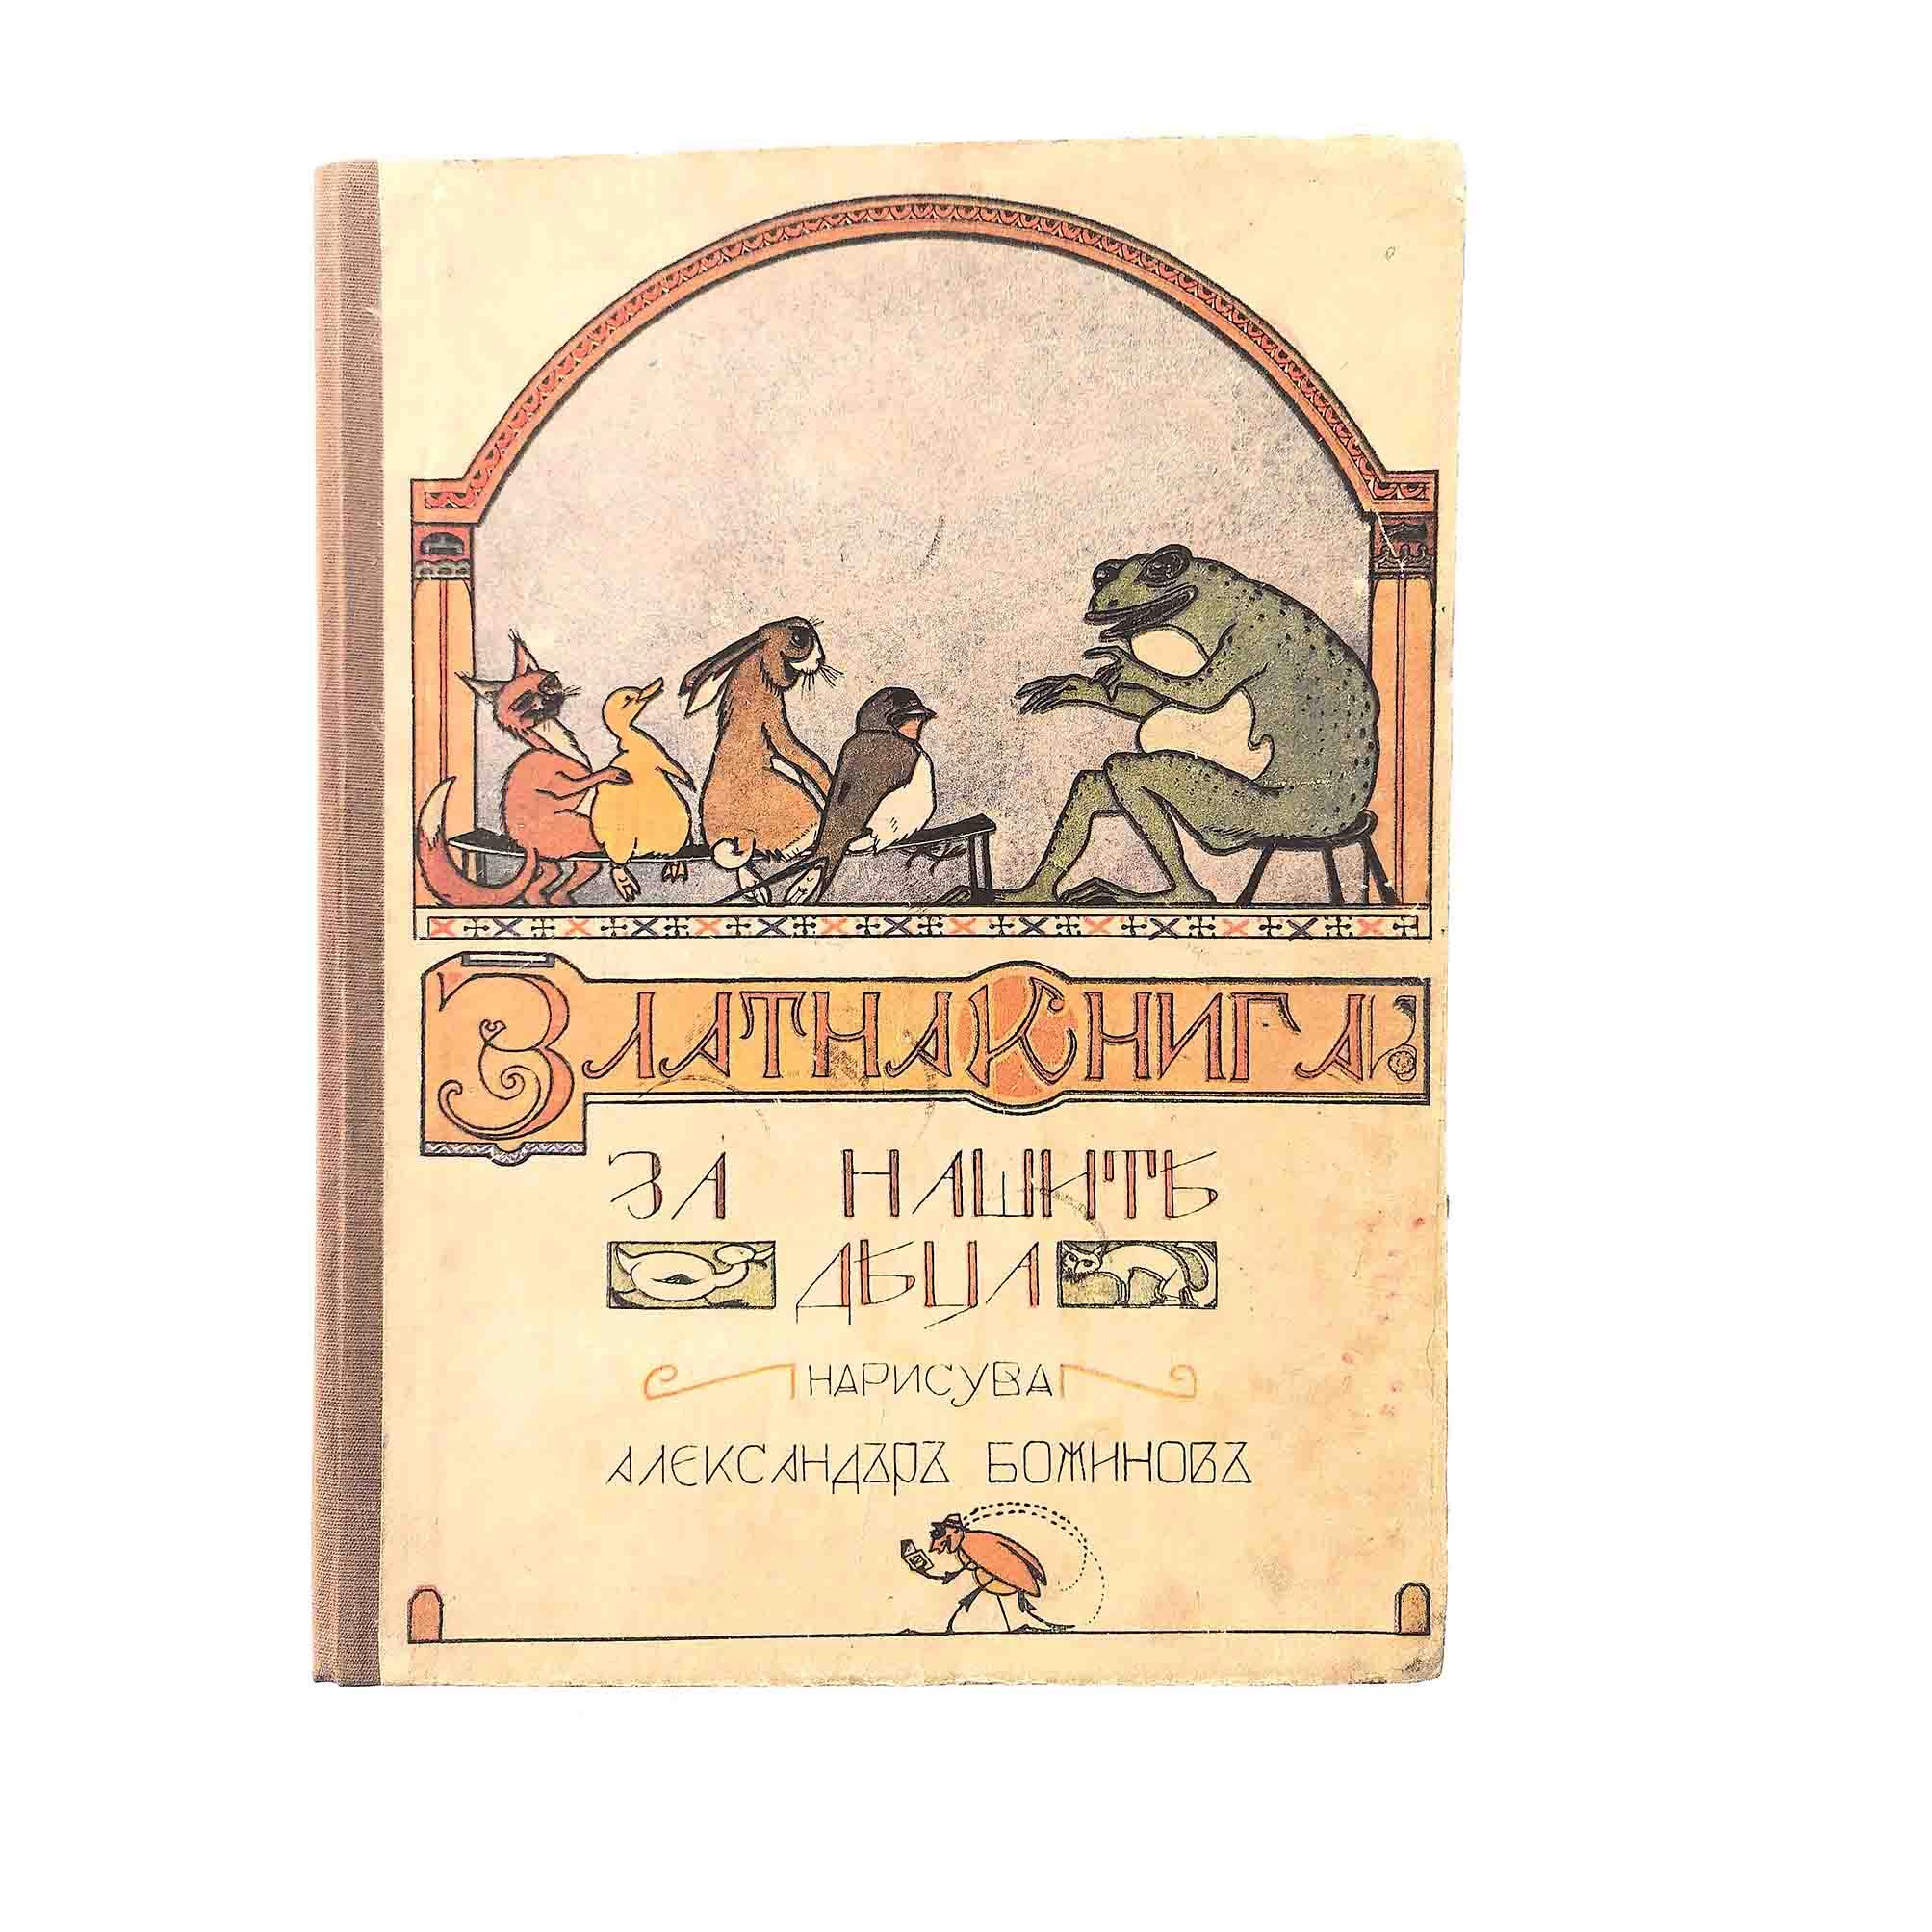 5964-Bozhinov-Zlatna-Kniga-1921-Cover-Recto-free-N.jpg